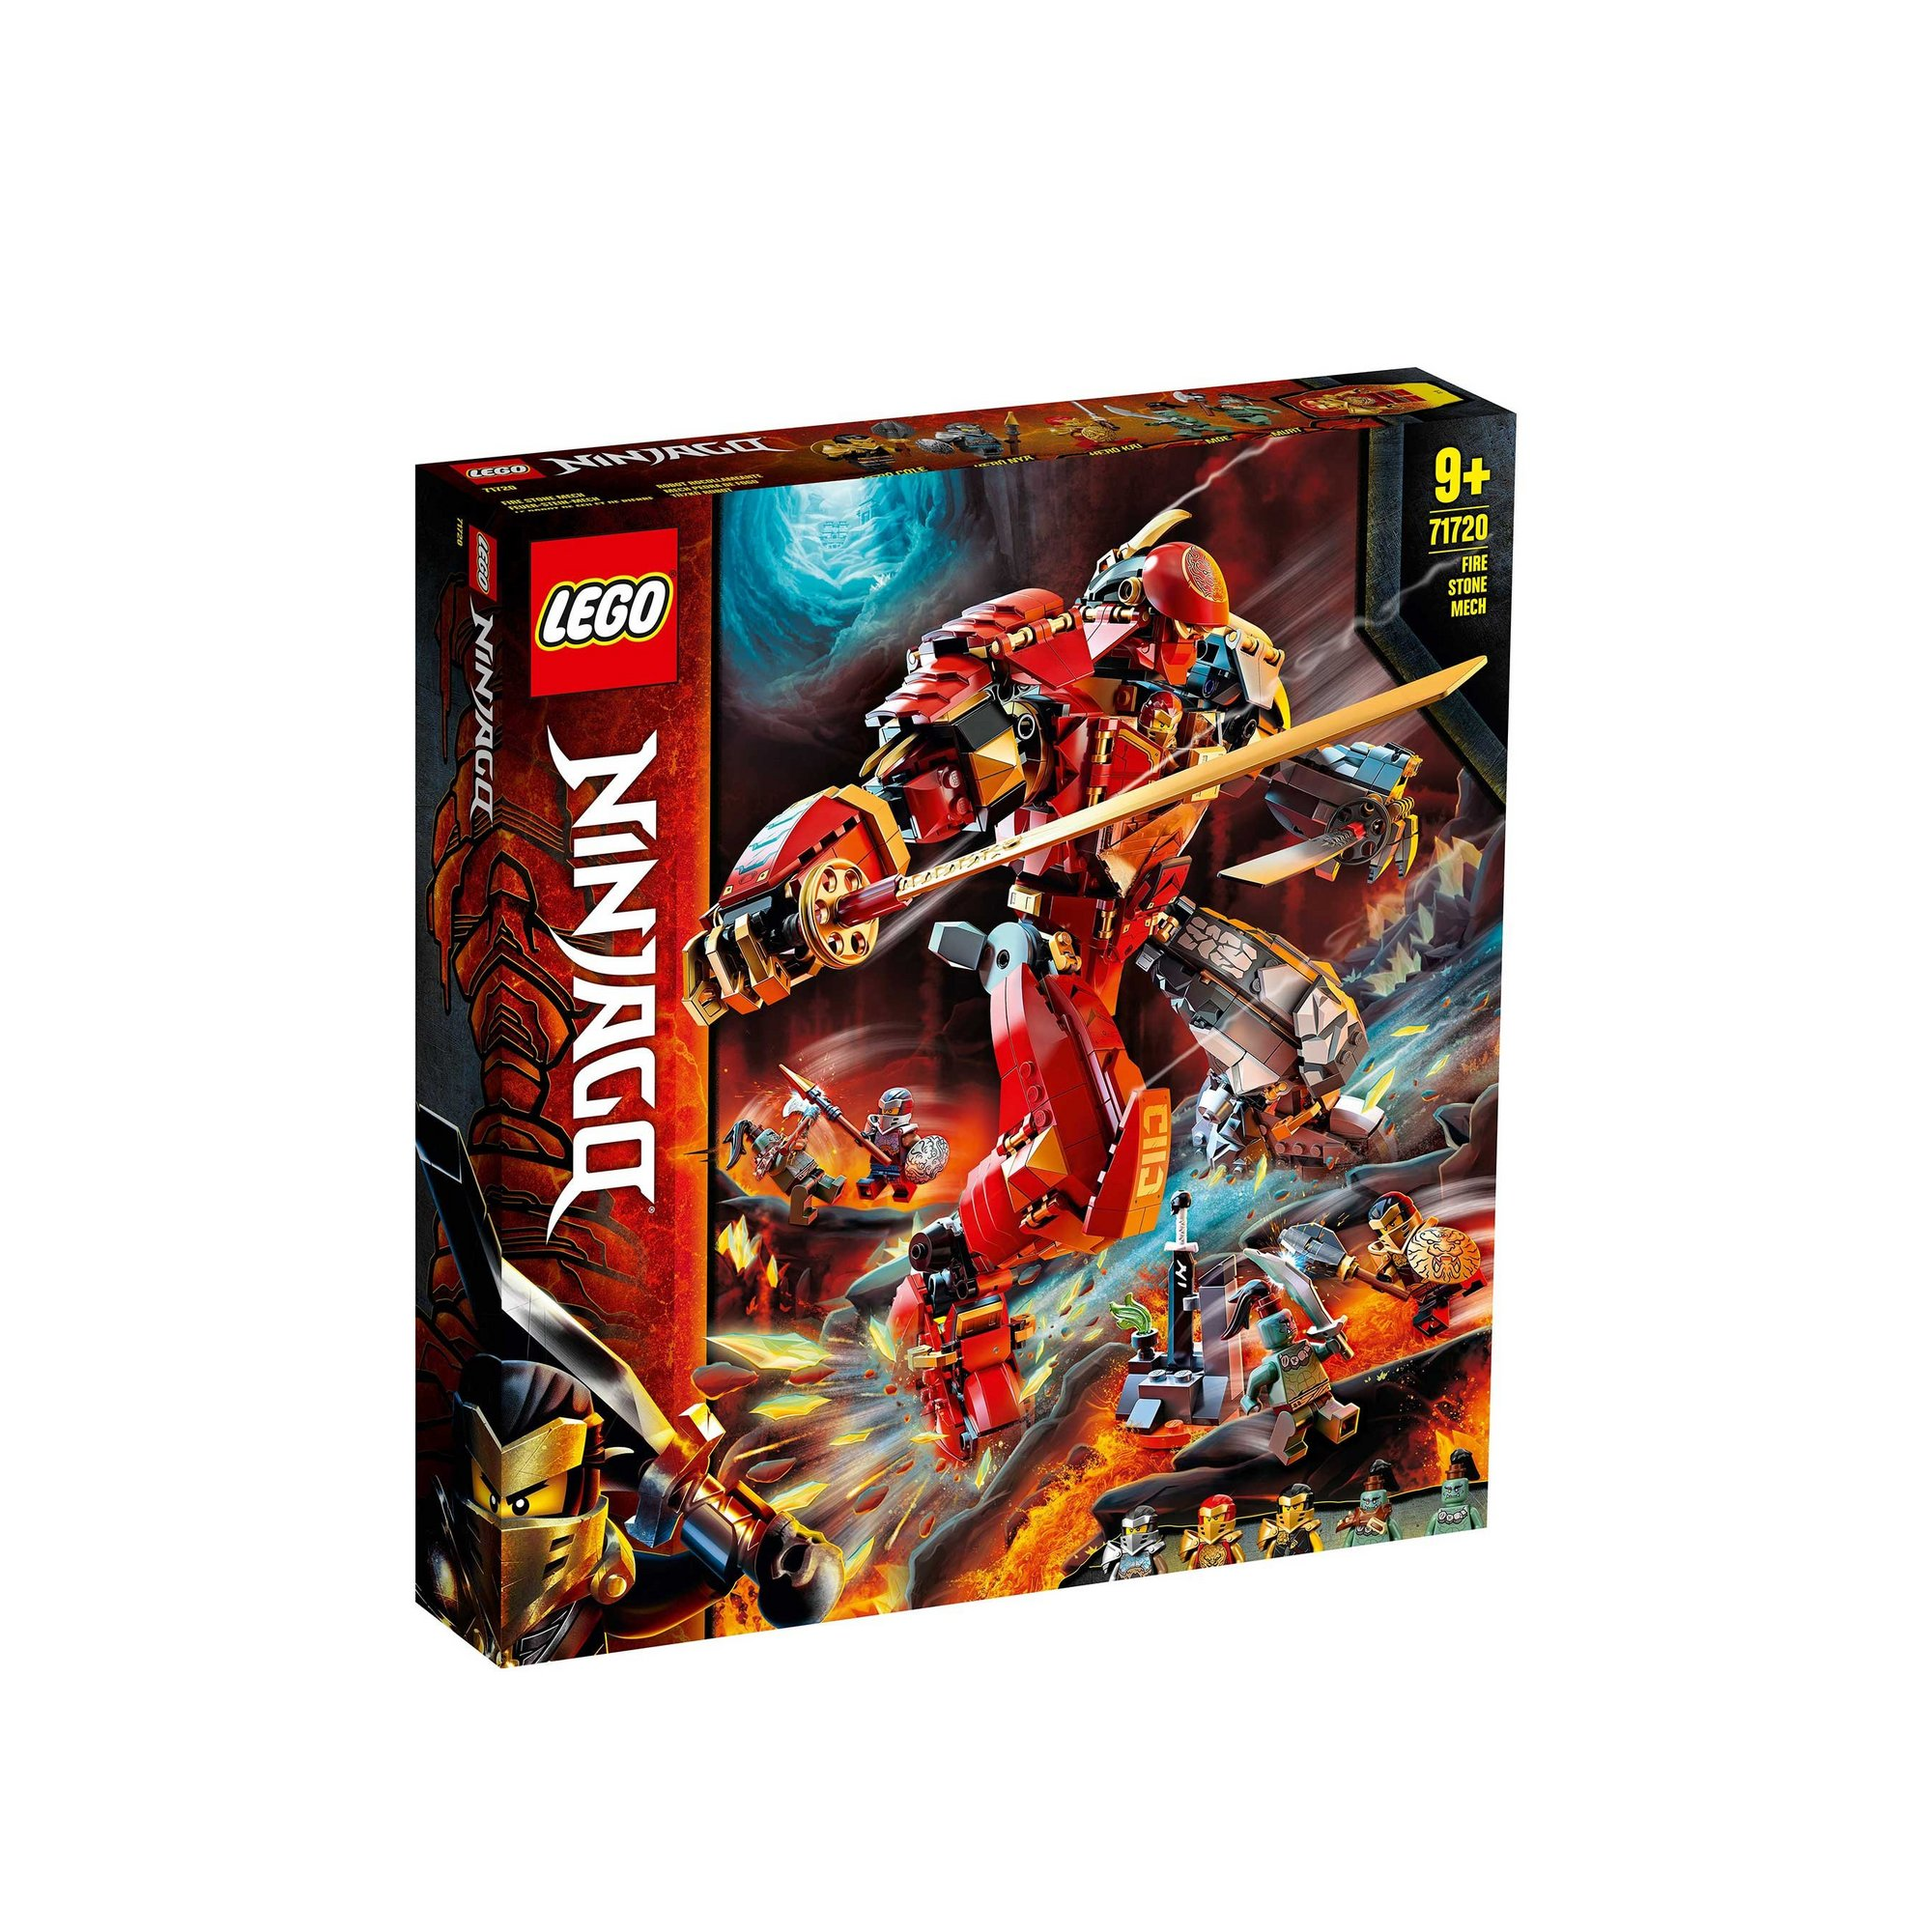 Image of LEGO Ninjago Fire Stone Mech